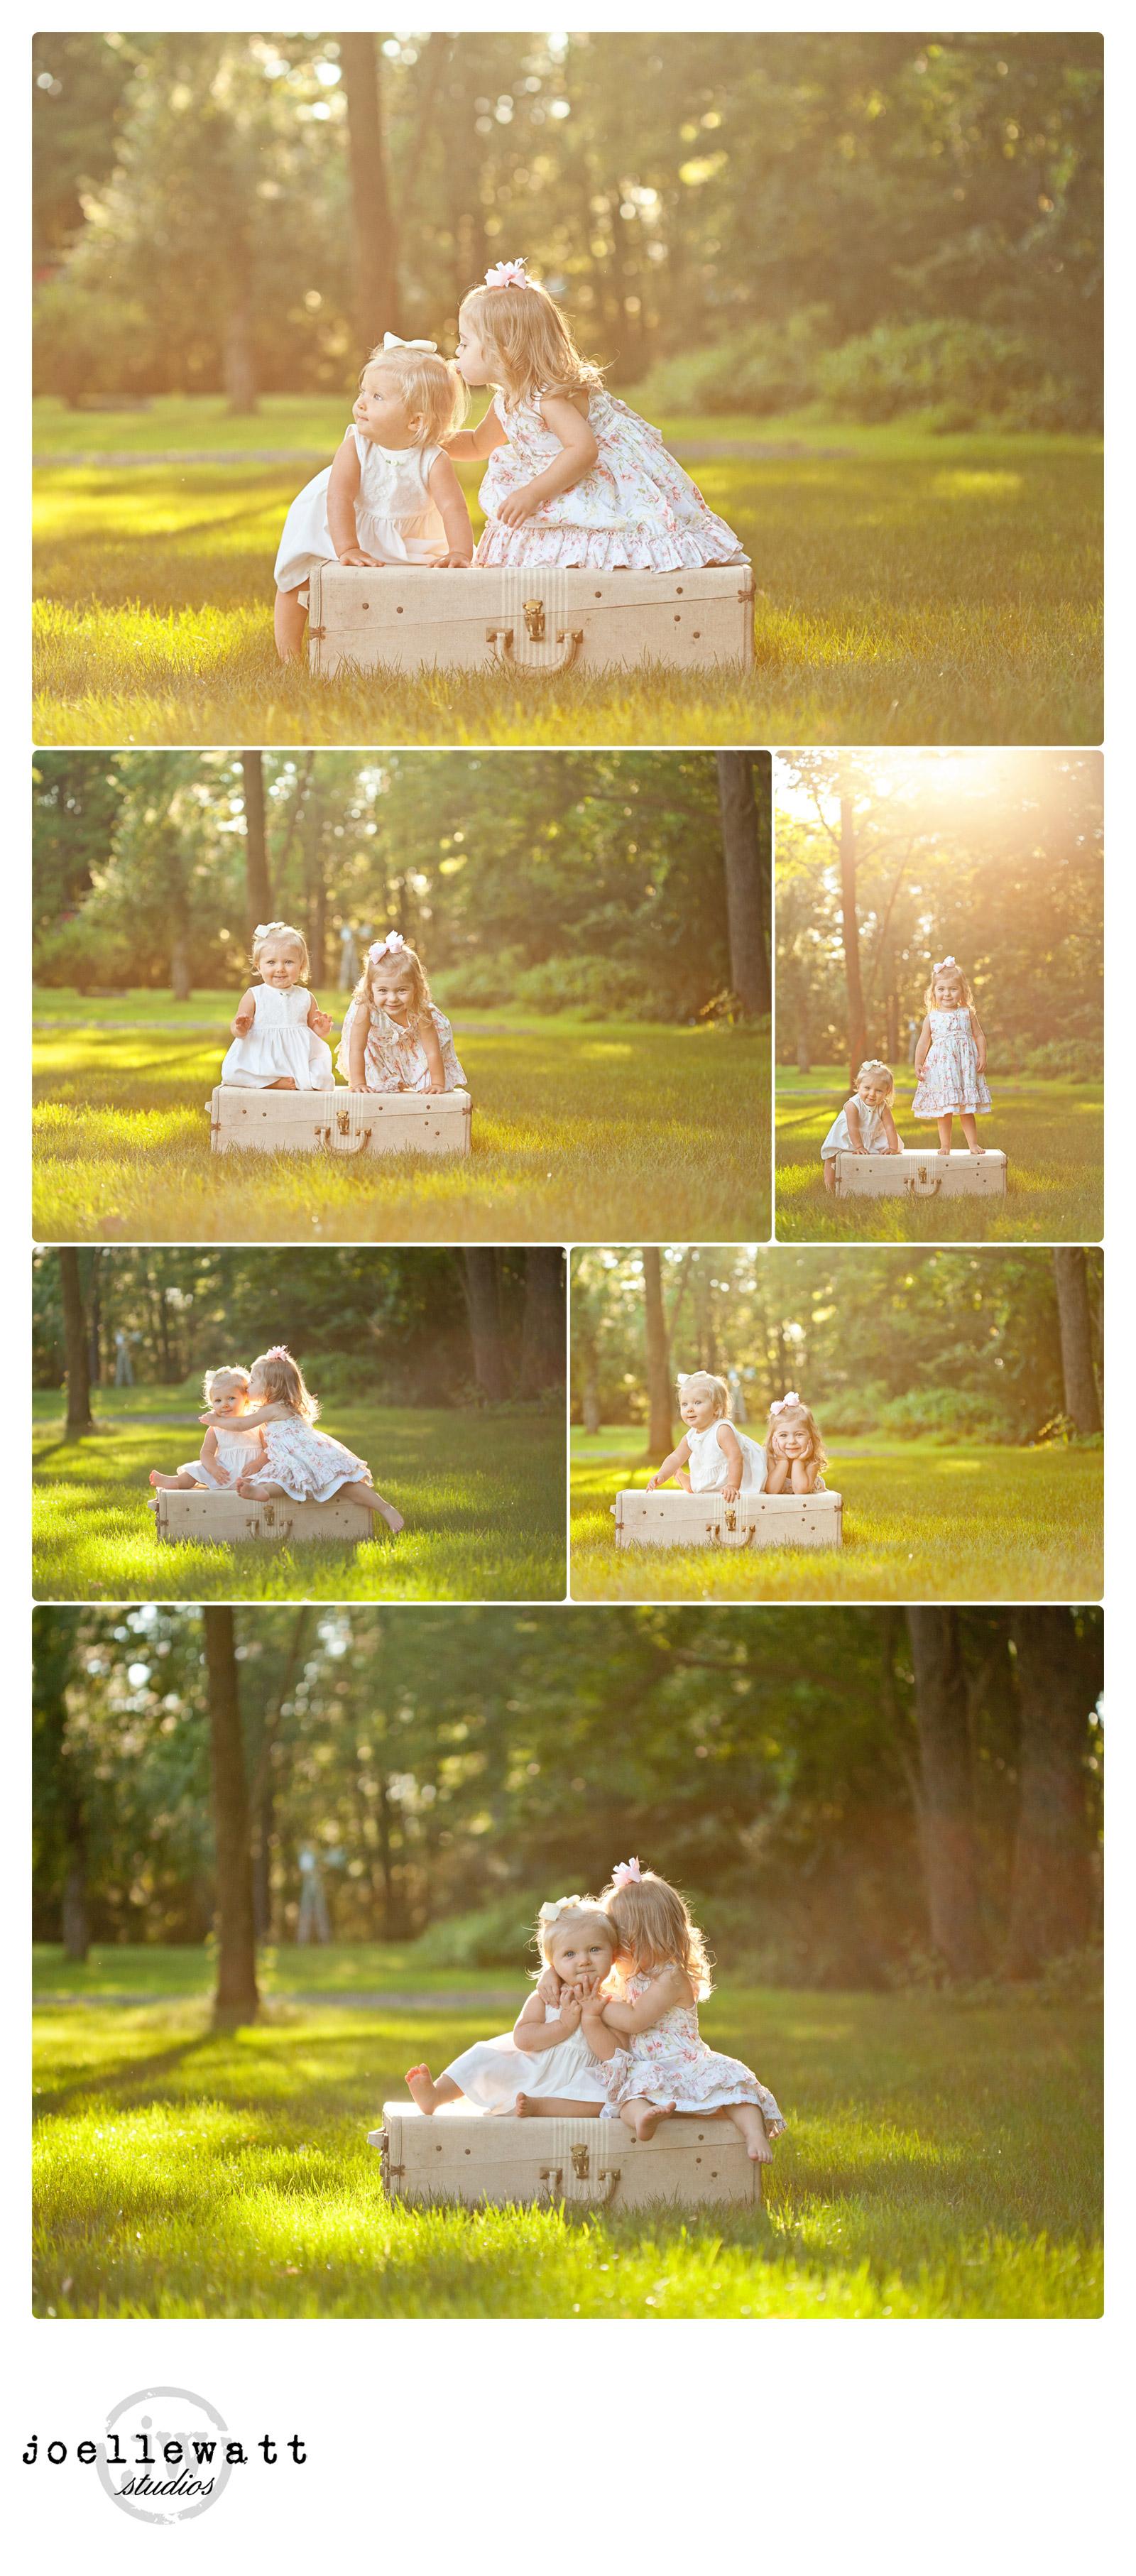 Blog-Collage-1375276971192.jpg